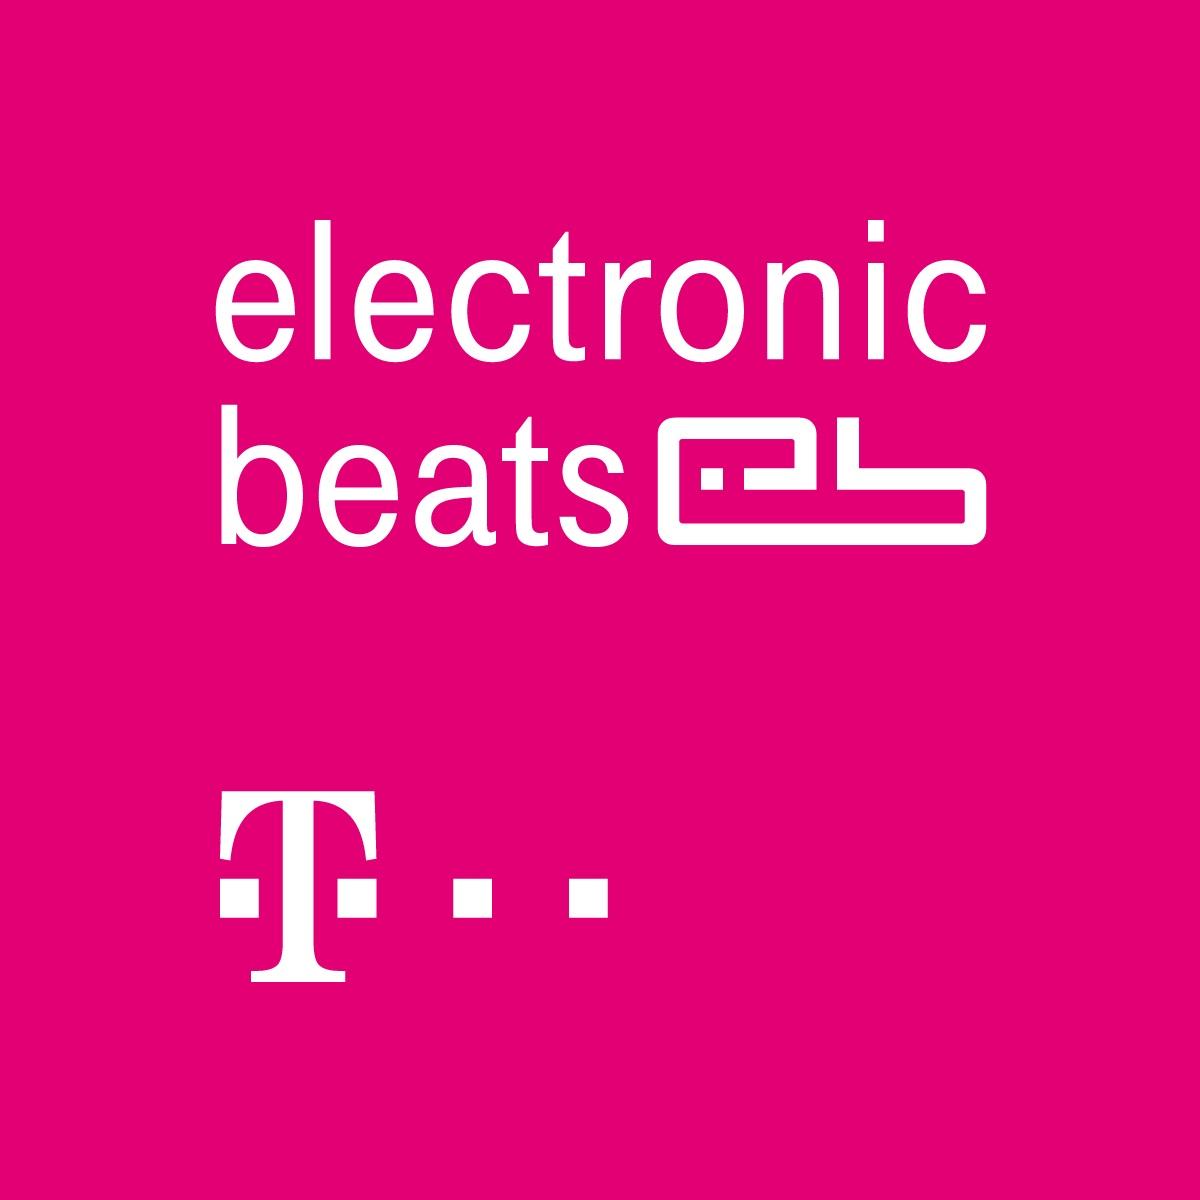 Telekom anunta 1 an de #Netliberare si lanseaza oficial platforma Telekom Electronic Beats